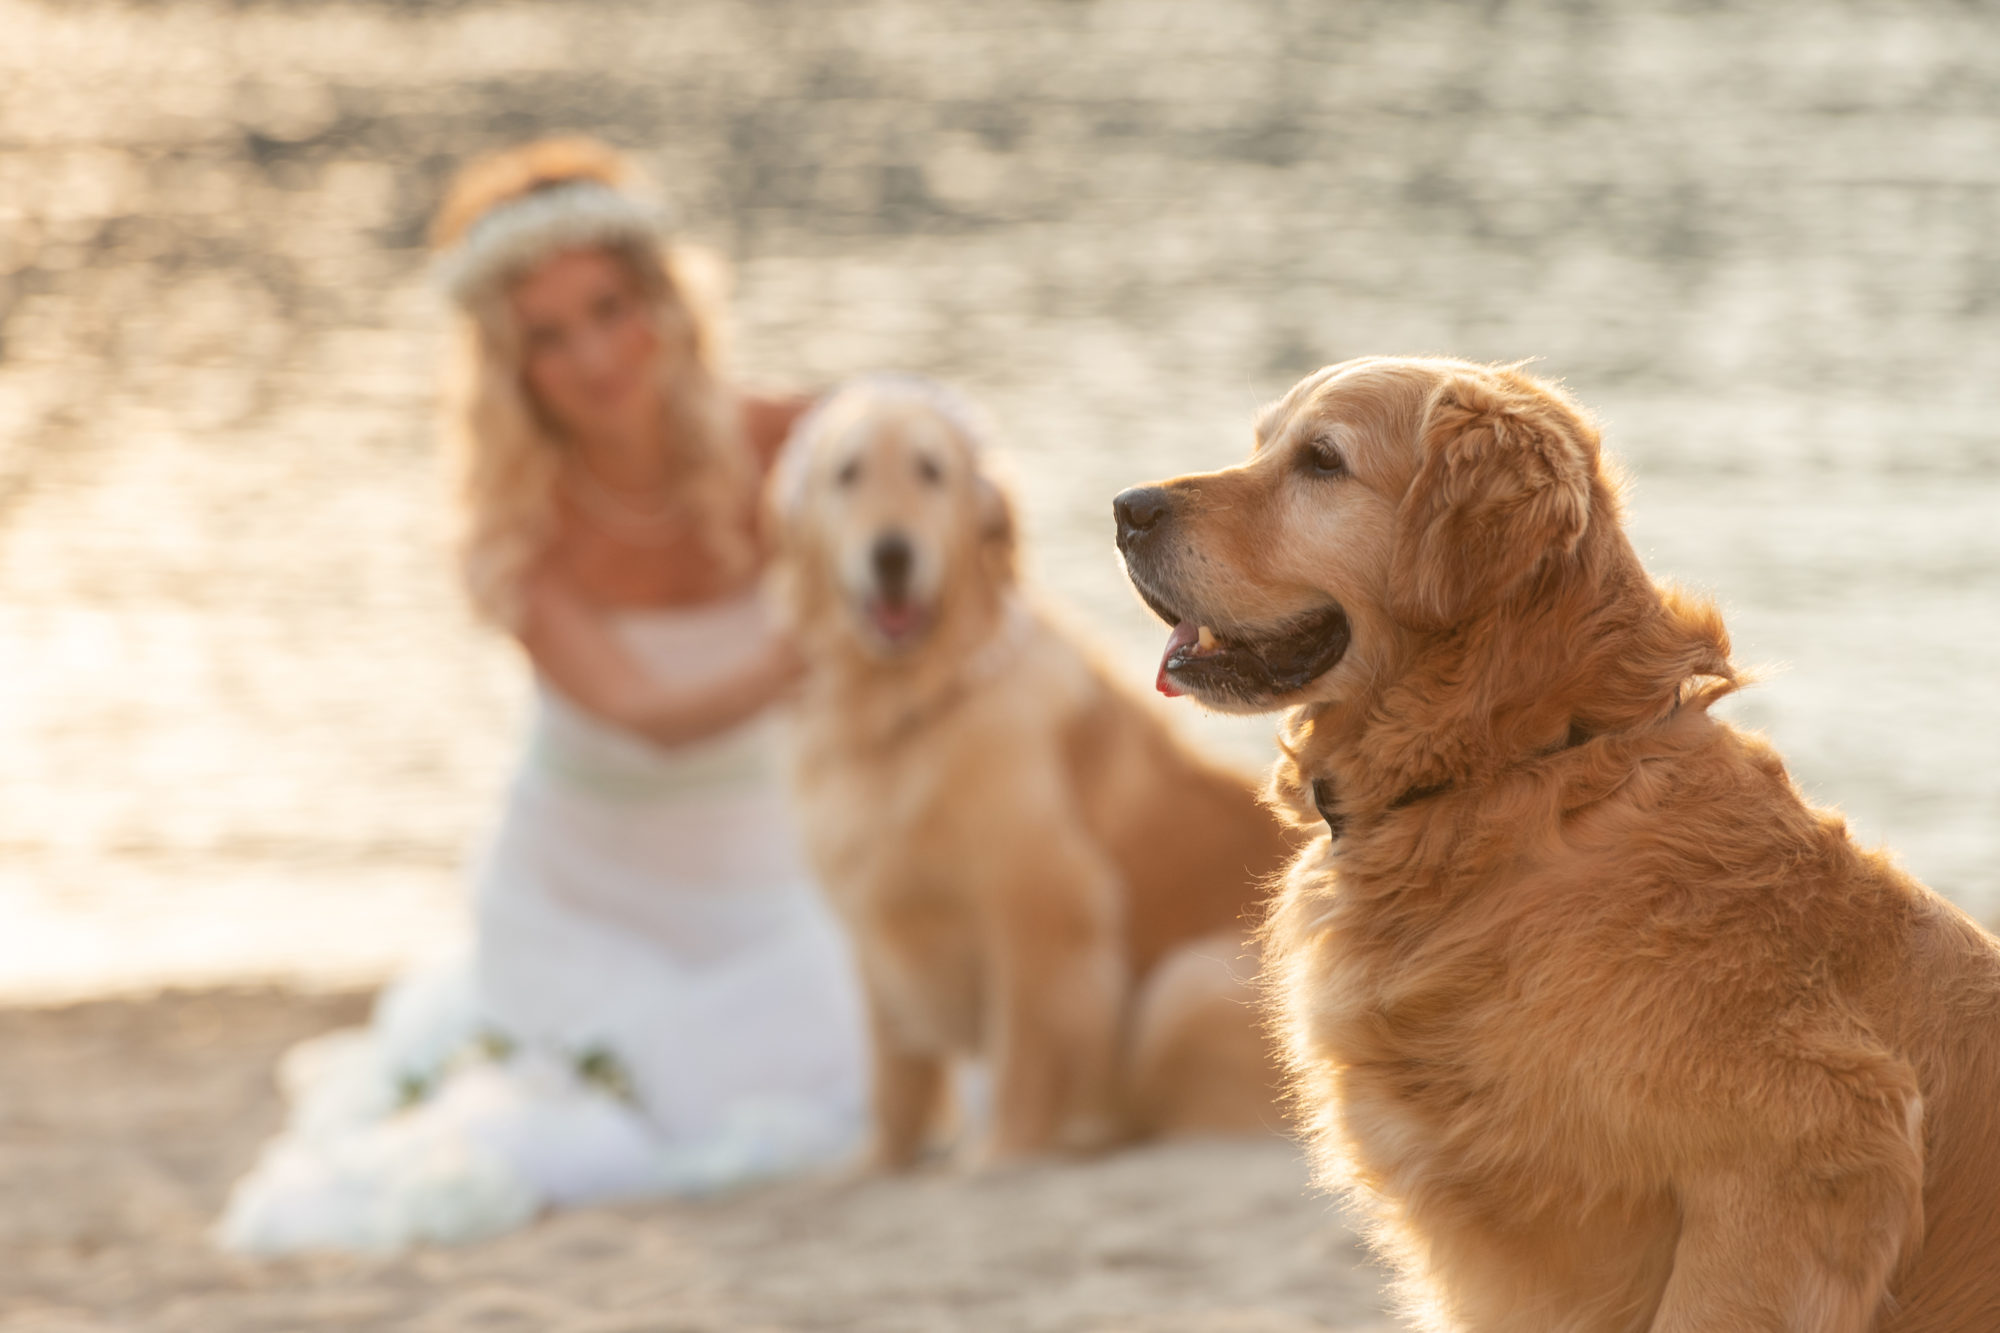 wedding dog sitter - Dog Special Guest